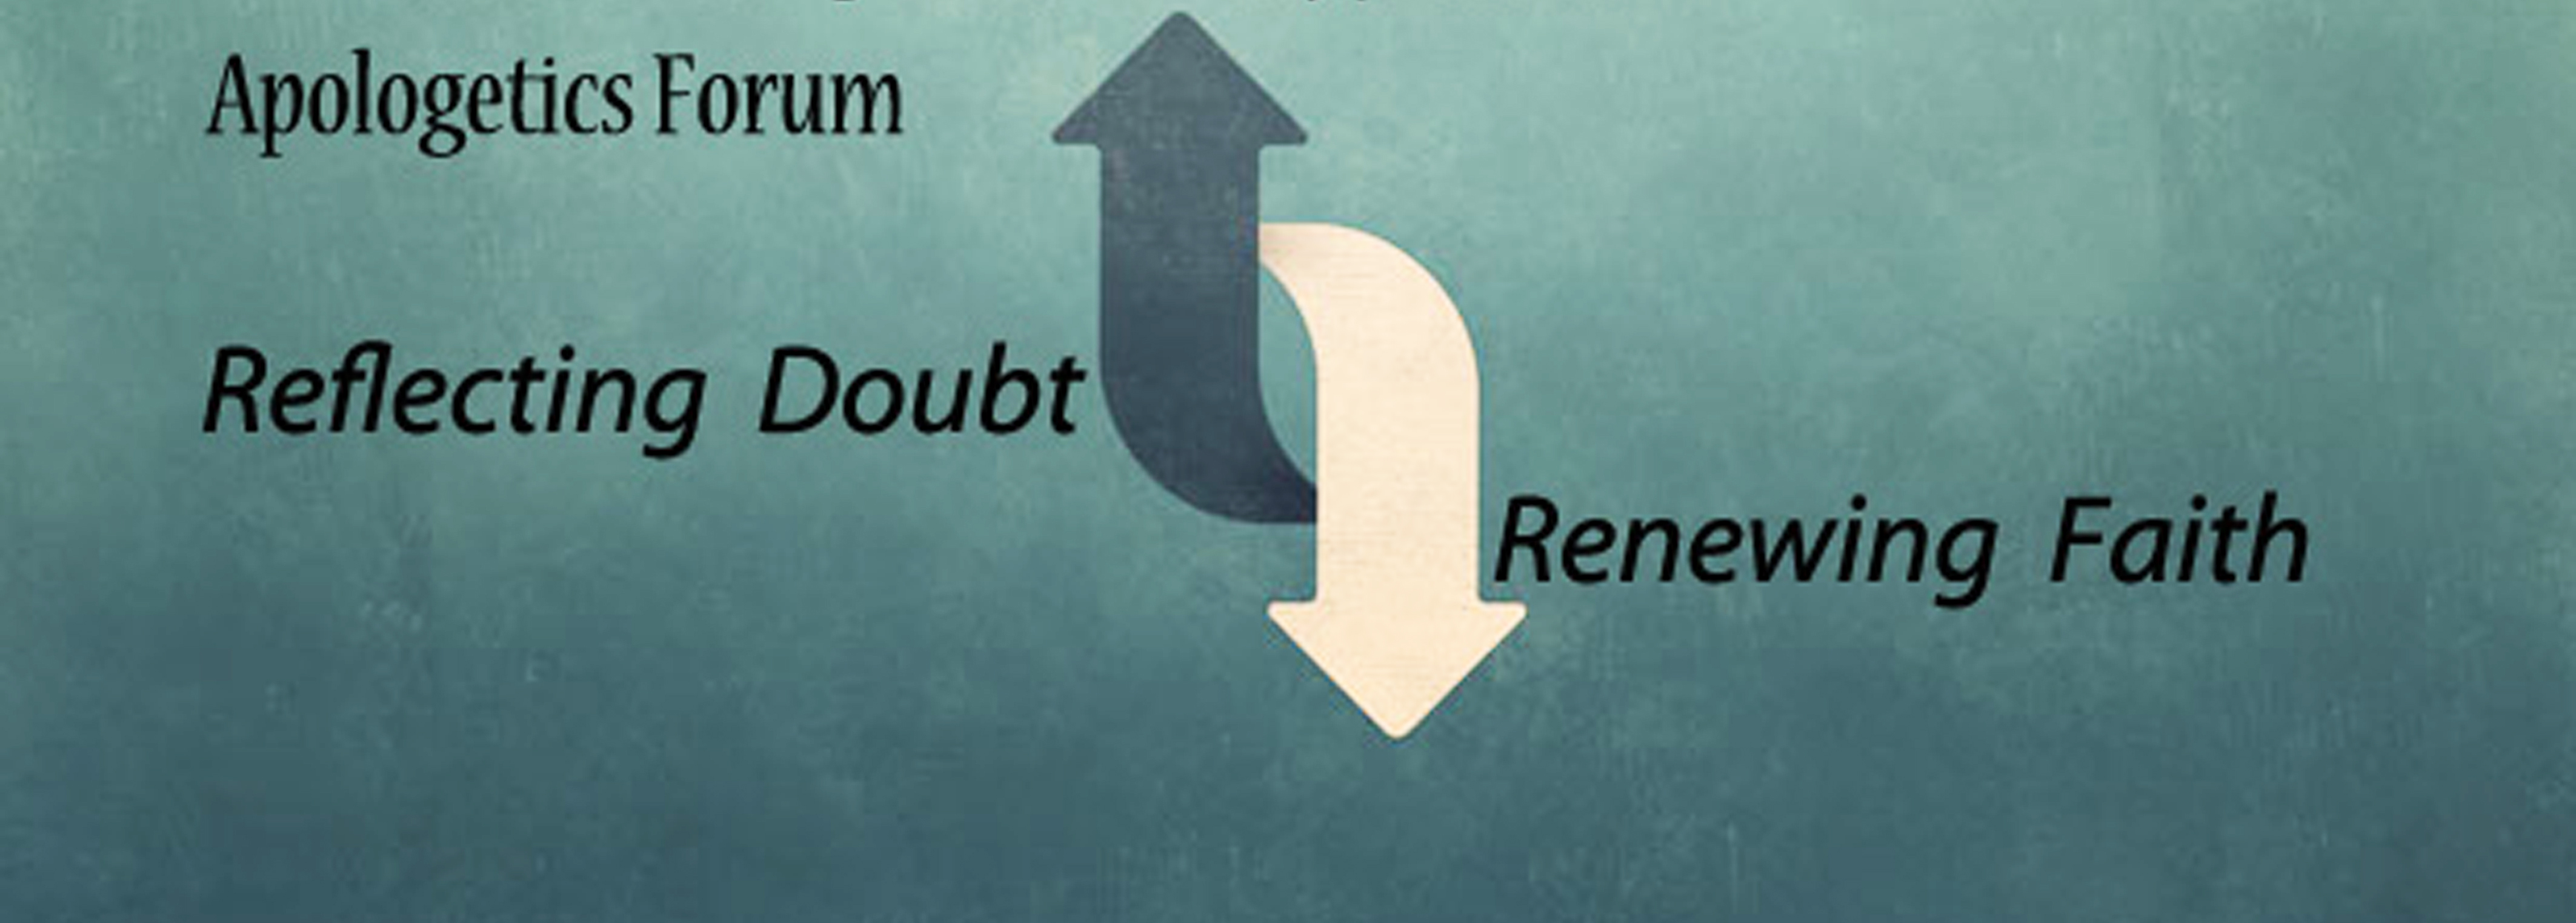 Reflecting Doubt Renewing Faith 1